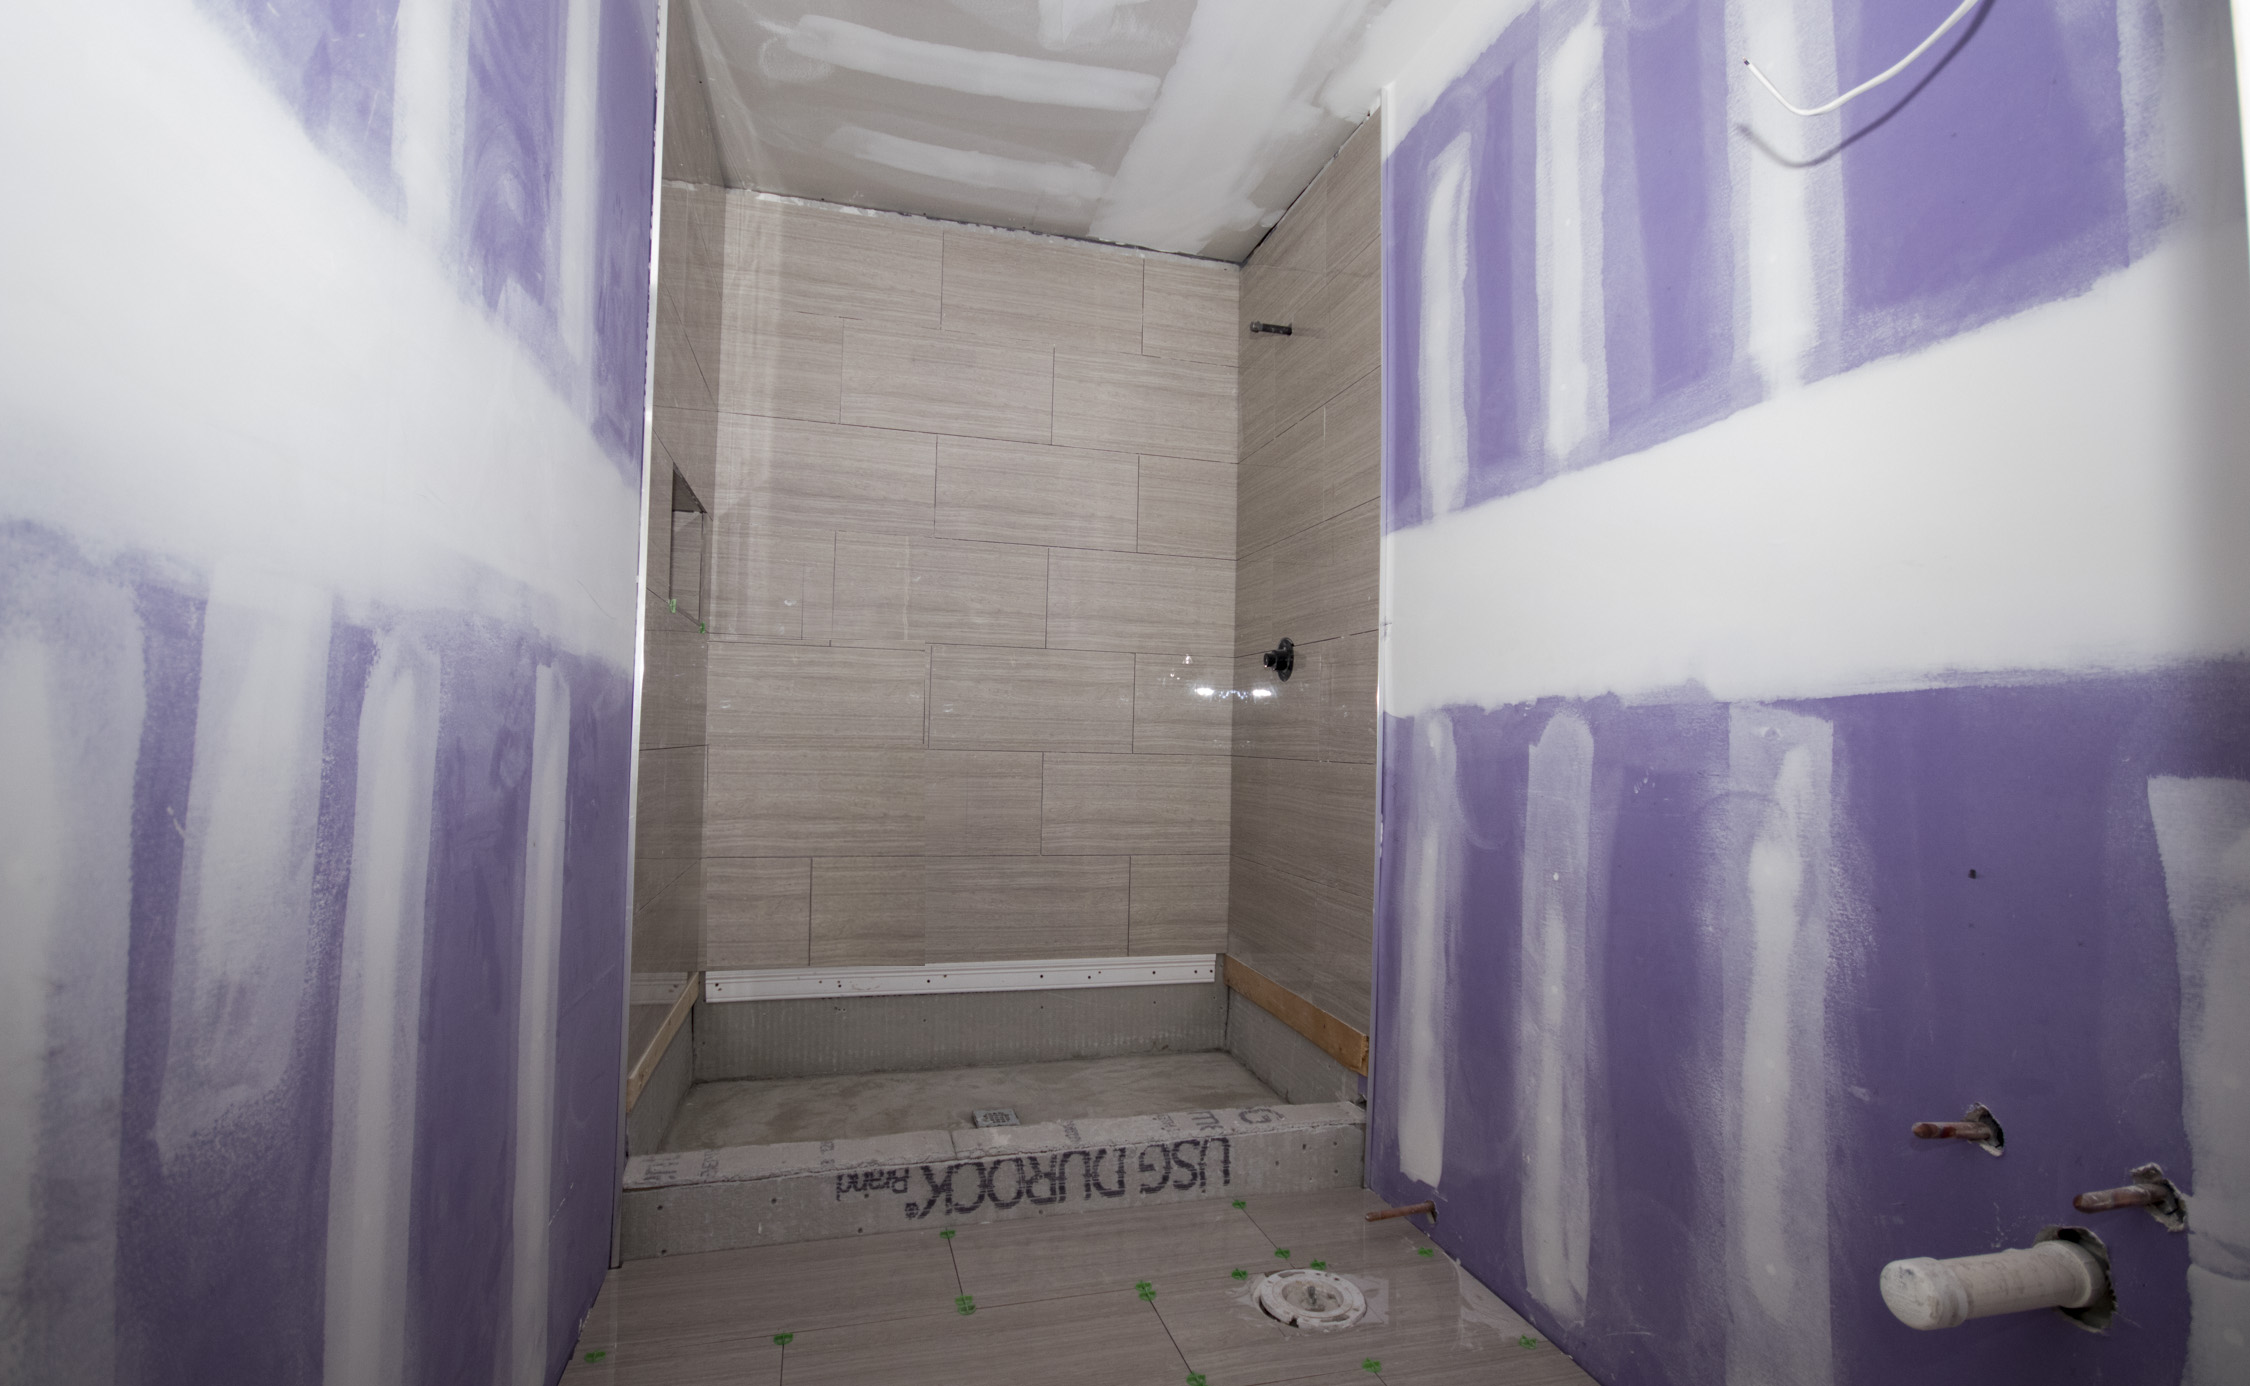 P. Northeast Contractors 27 Darling Street Boston Condo Renovation_44